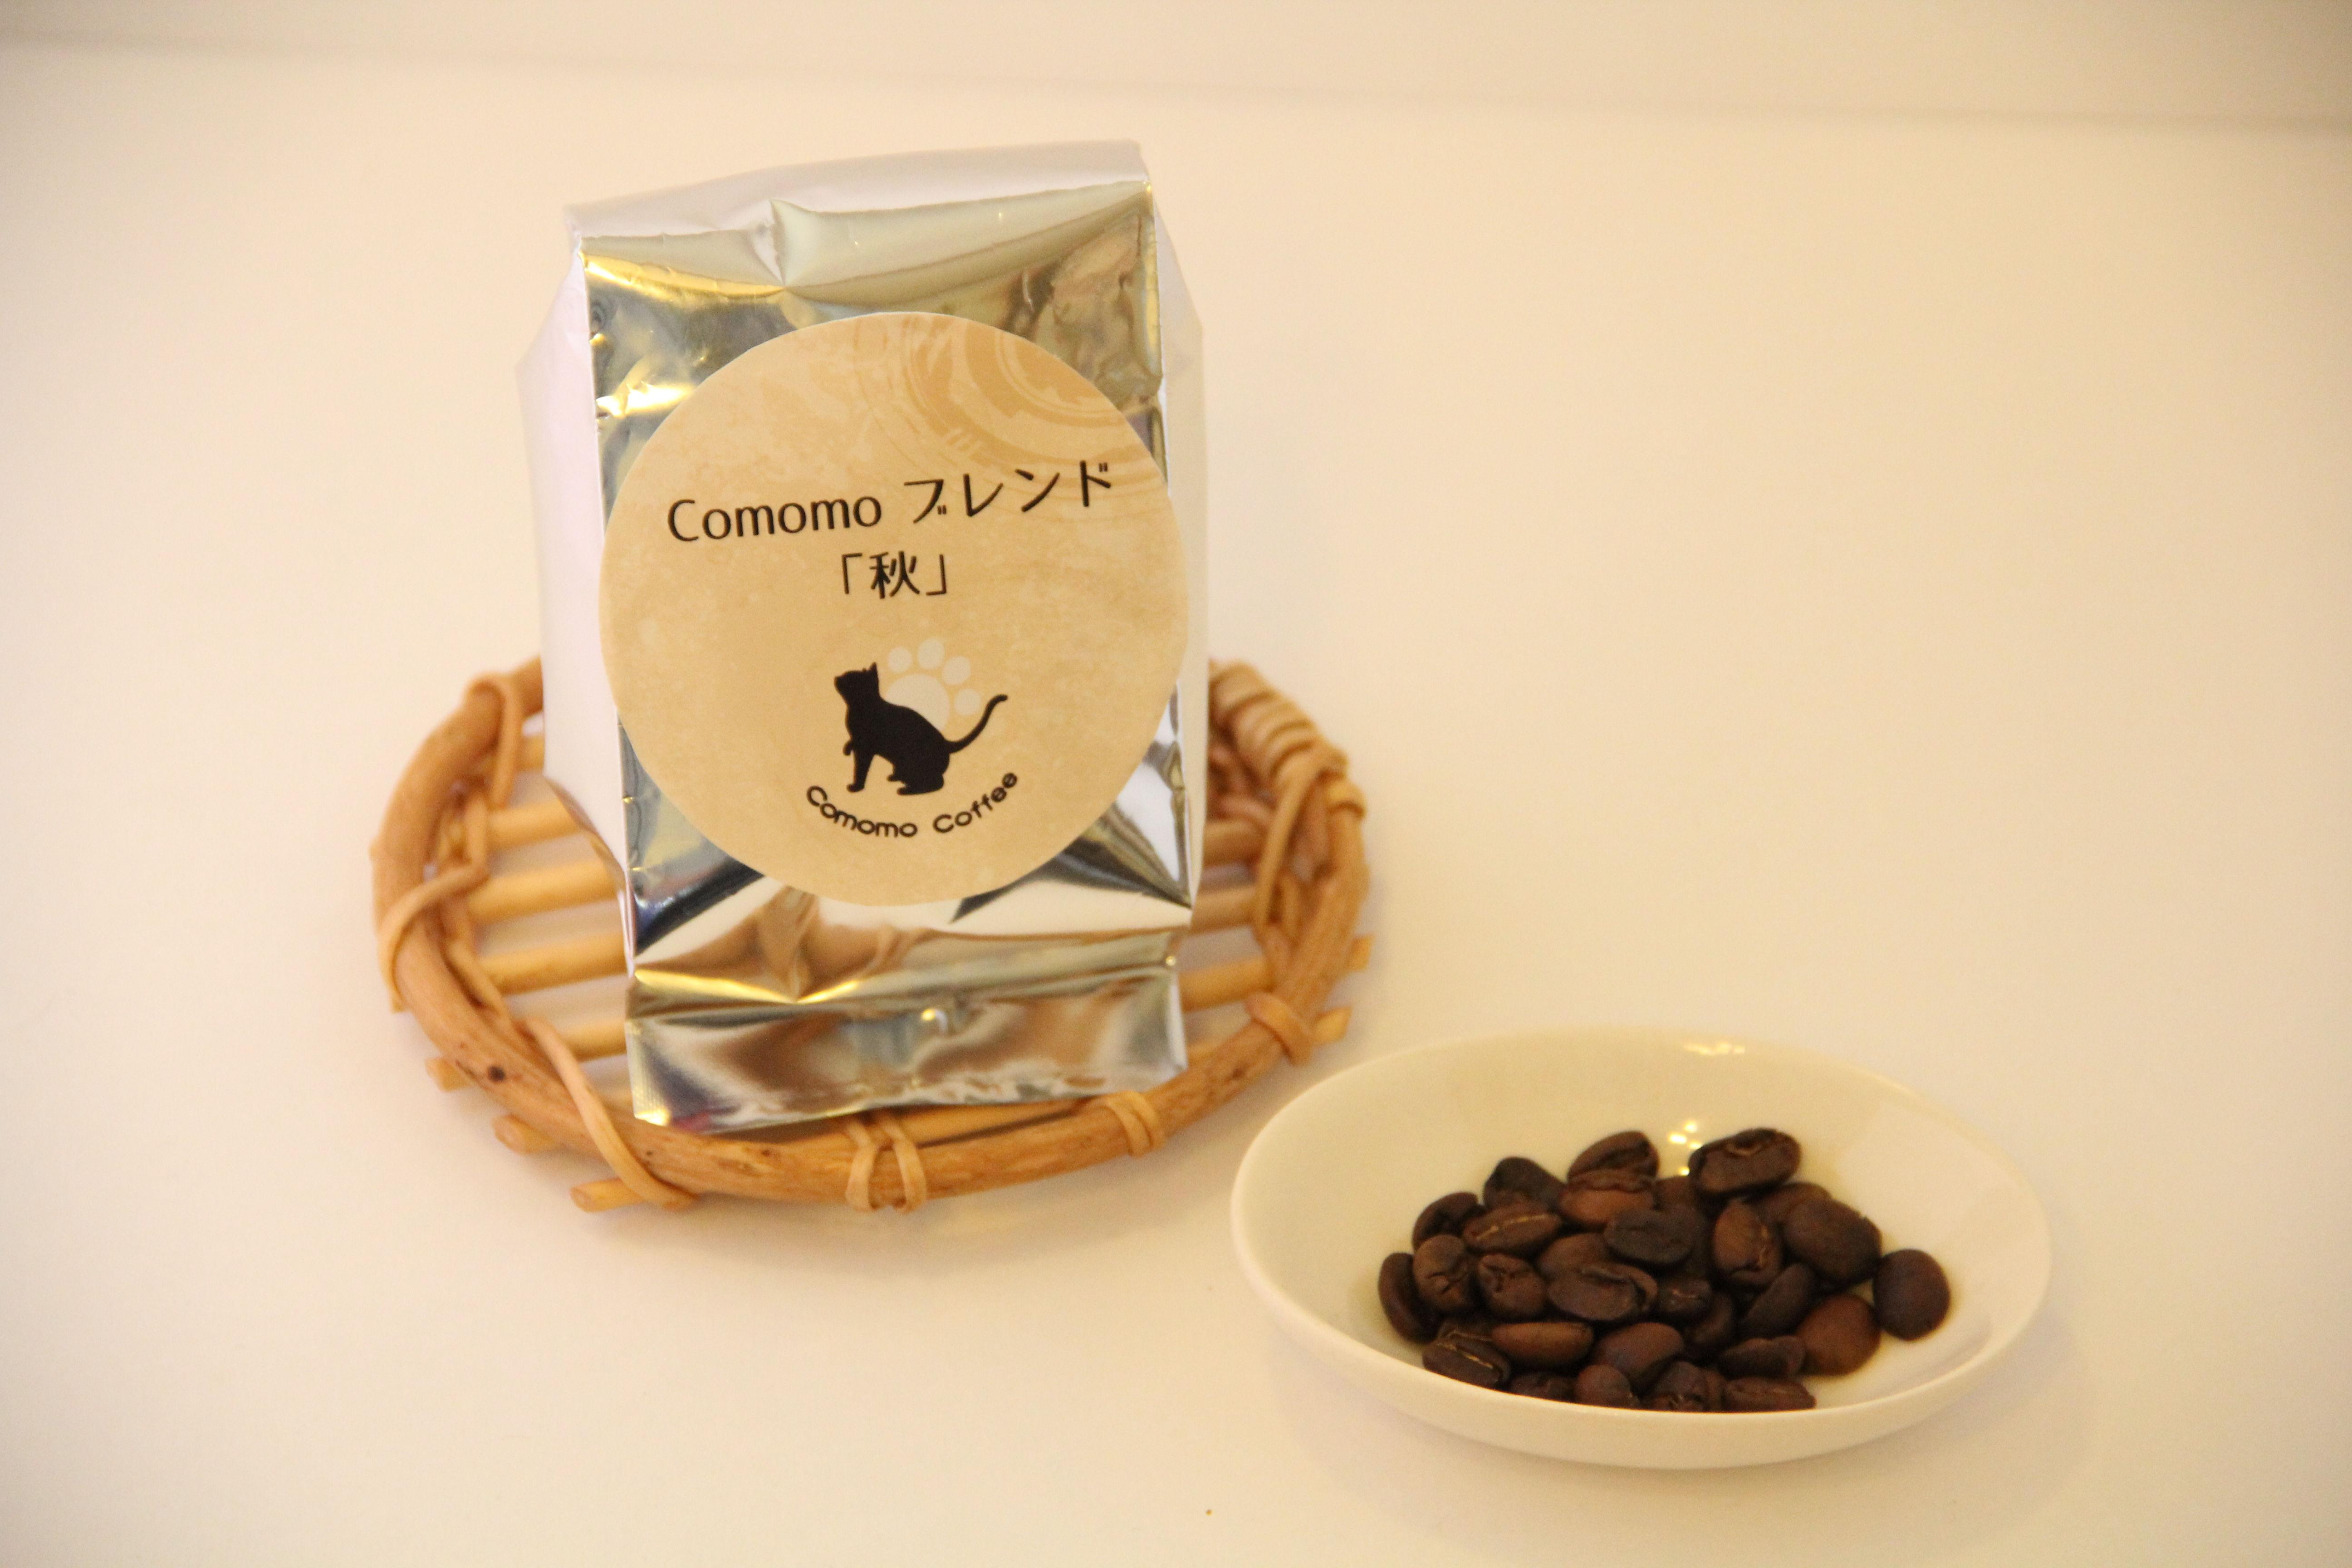 Comomoブレンド「秋」100g(豆のまま)